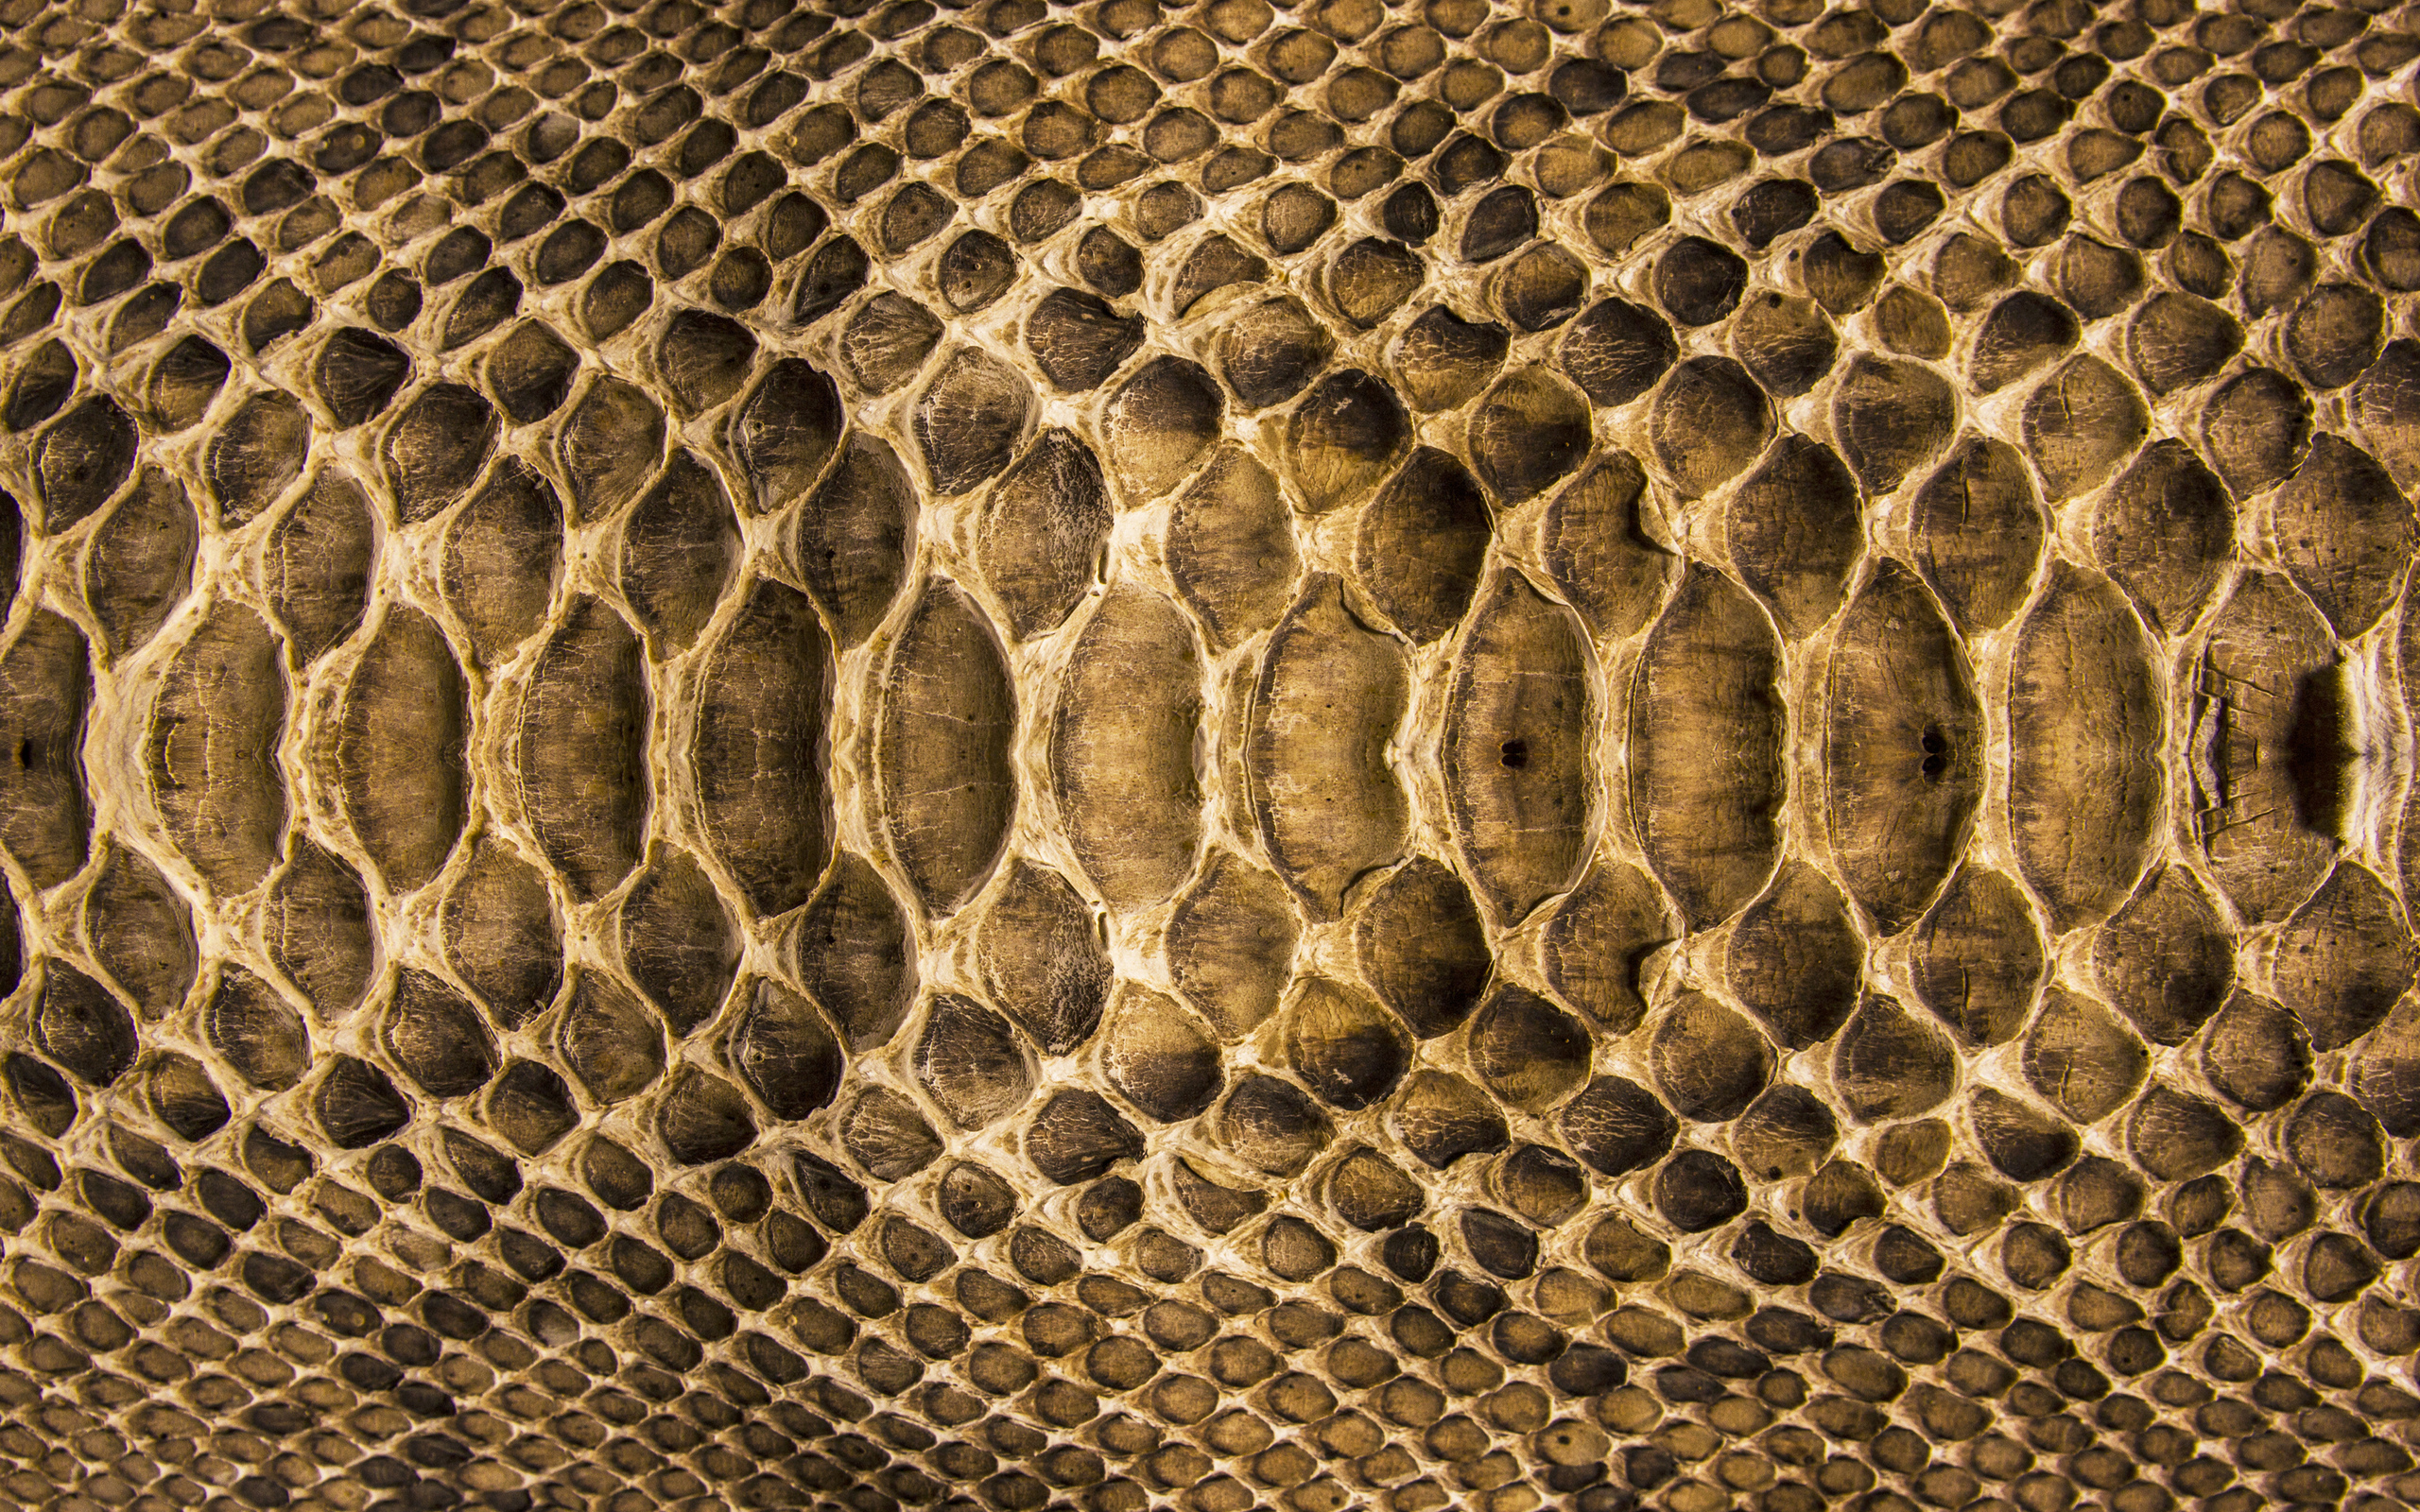 Текстура кожи змеи  № 3269858 без смс